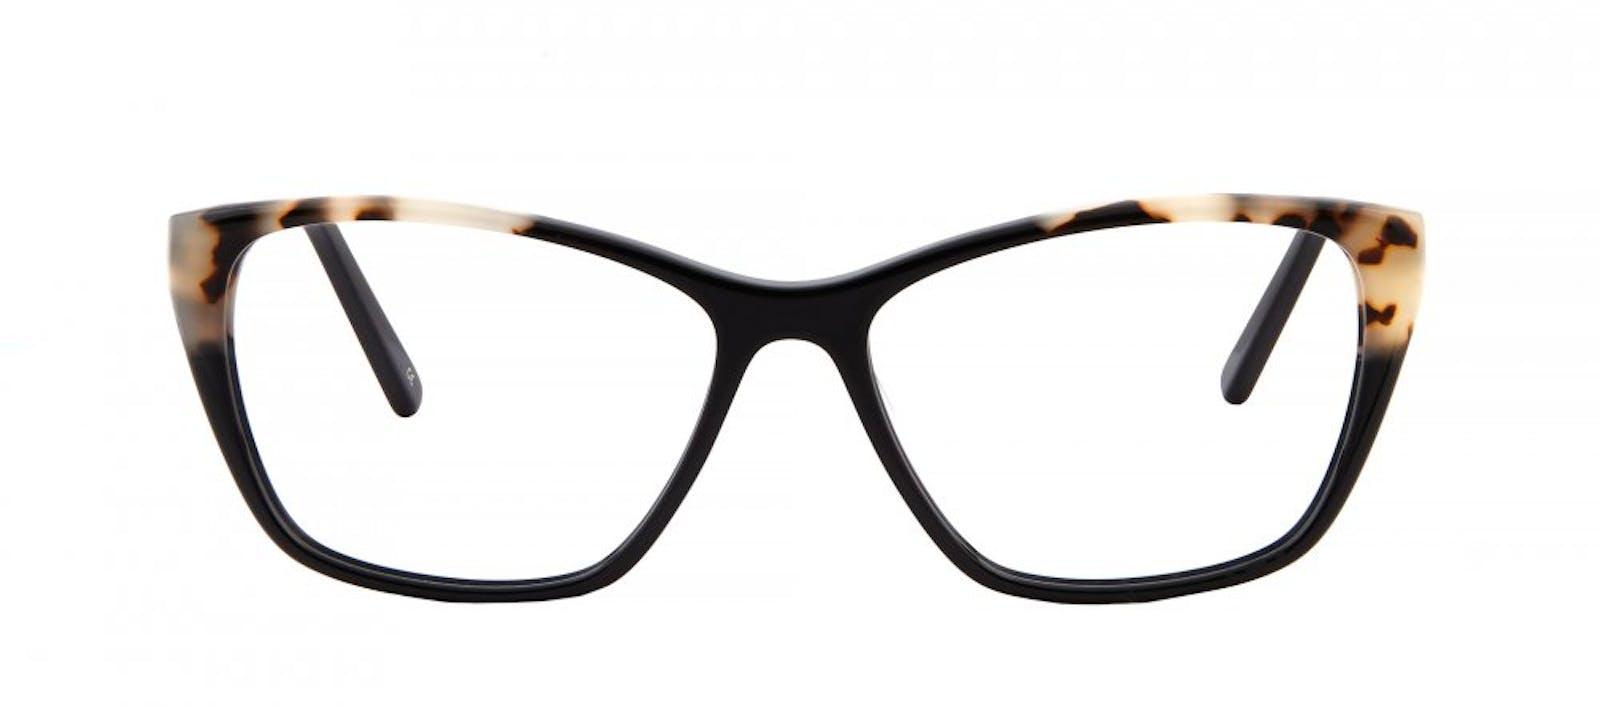 0231a8ba93 Affordable Fashion Glasses Cat Eye Rectangle Eyeglasses Women Myrtle Ebony  Granite Front